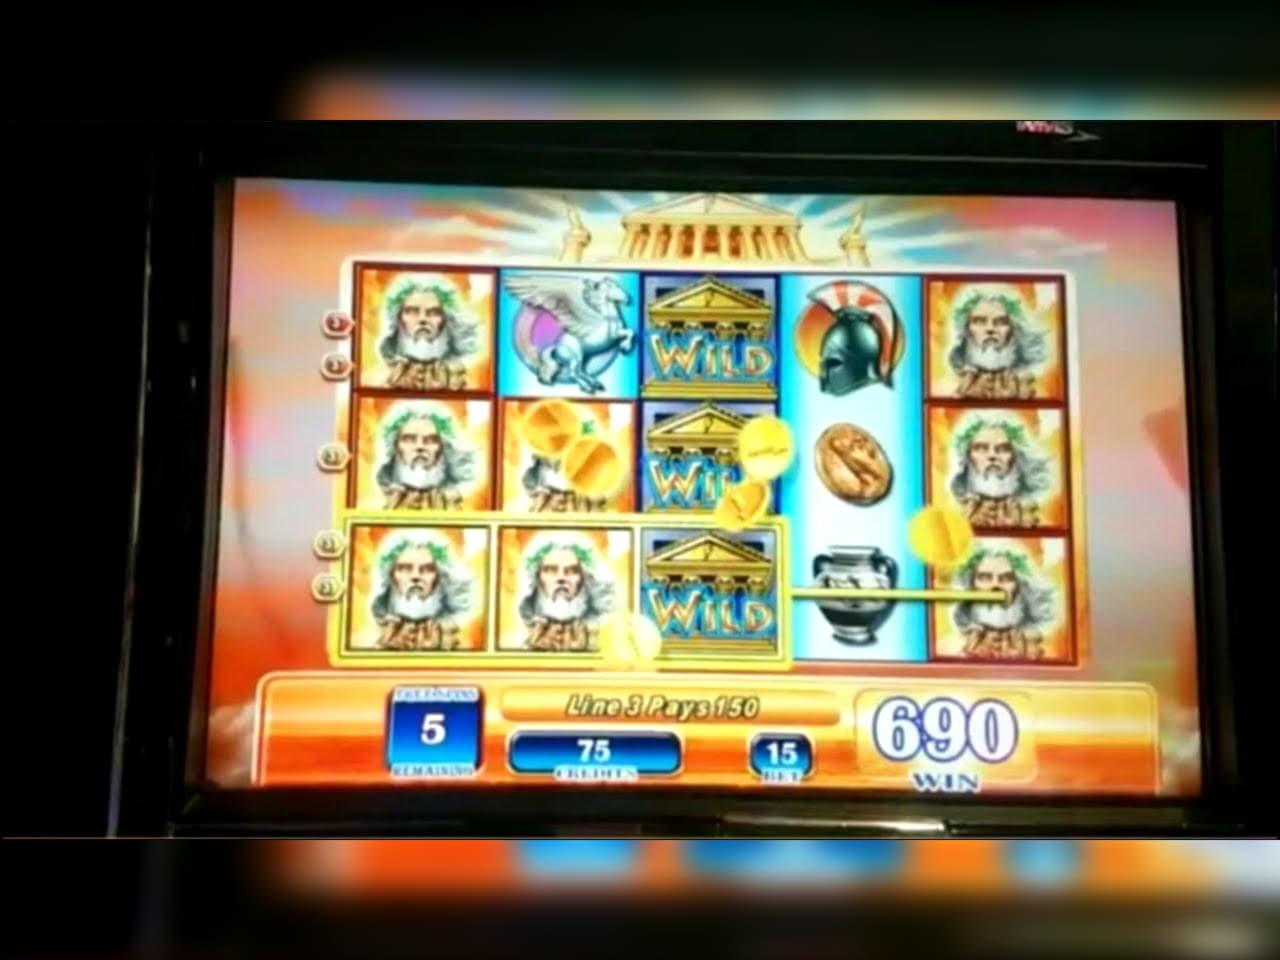 960% casino match bonus at Buran Casino